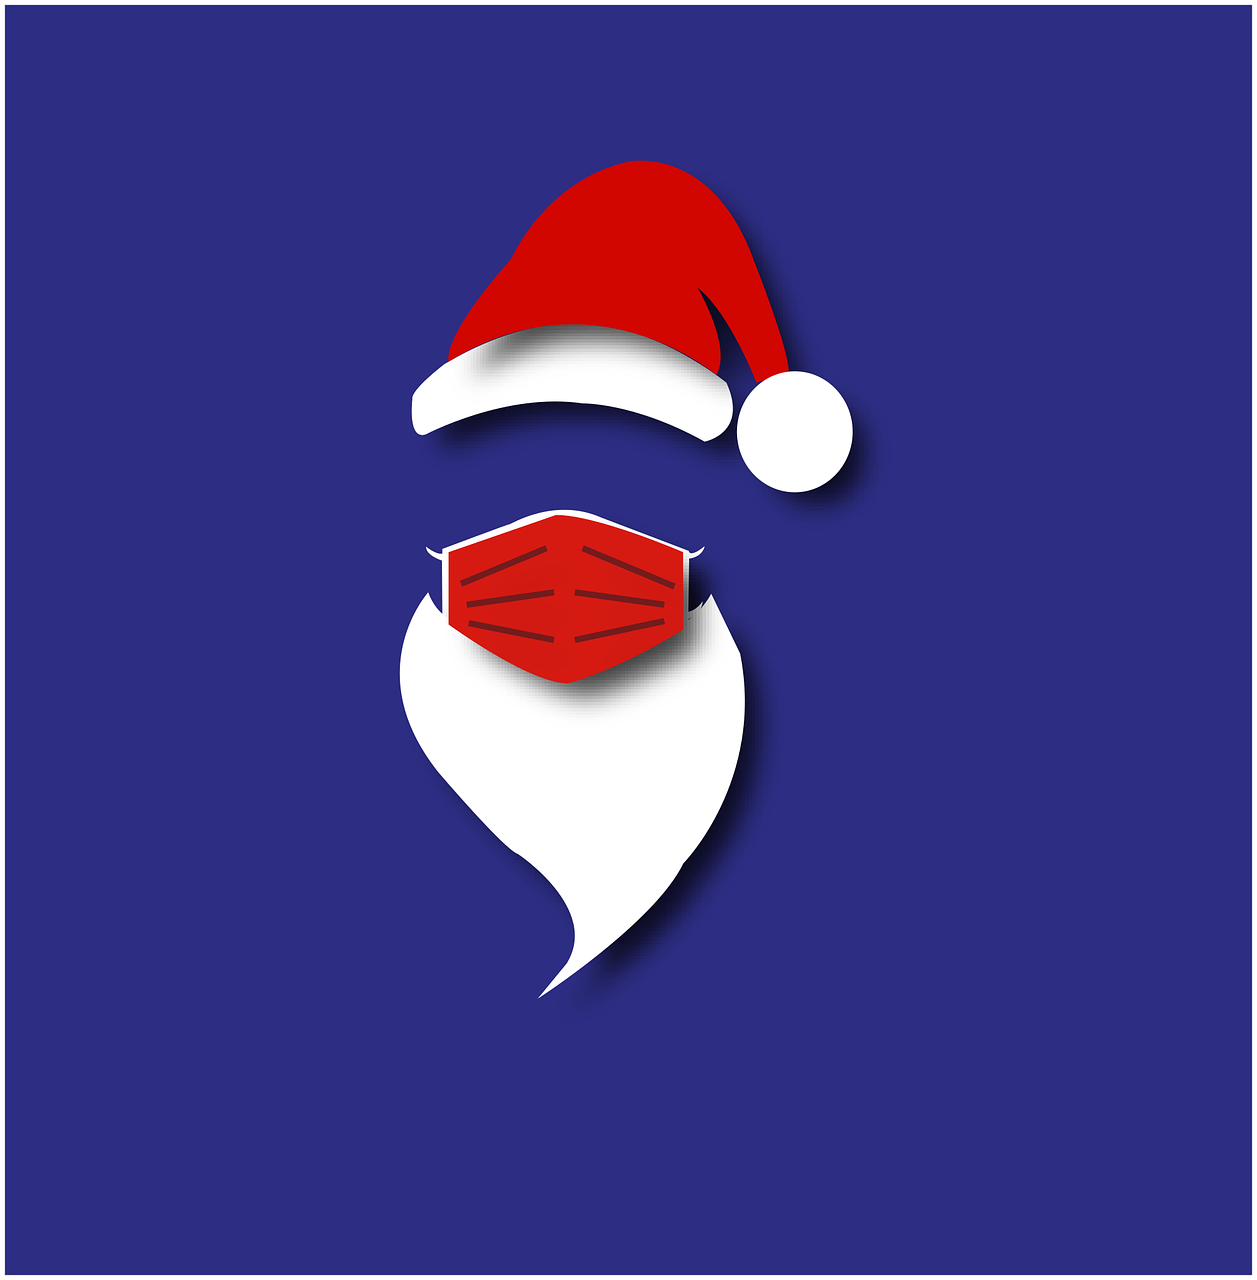 Santa Claus Nicholas Christmas  - Radoan_tanvir / Pixabay